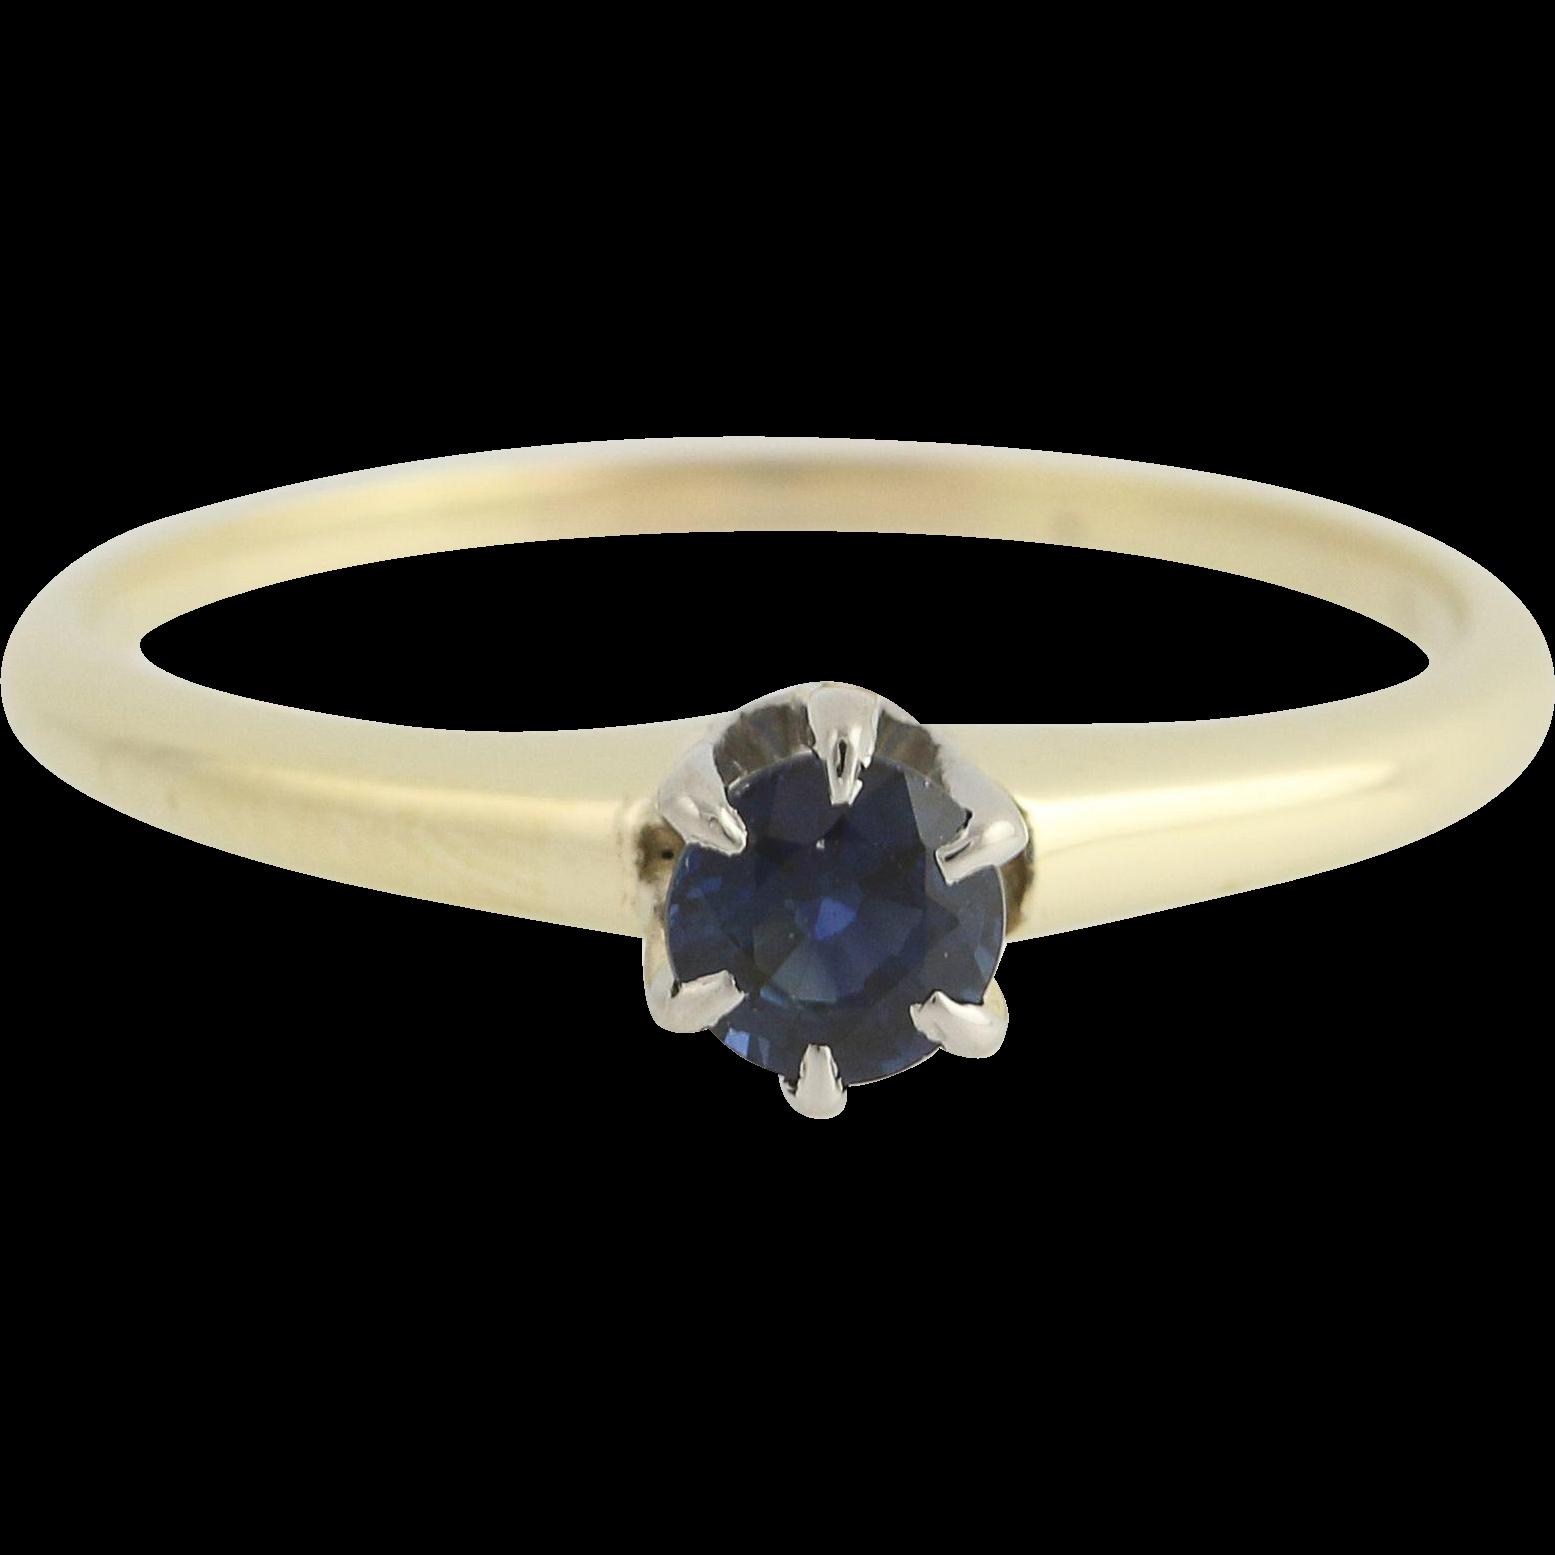 Art Deco Sapphire Ring - 14k Gold Palladium Round Solitaire 0.58ctw Engagement